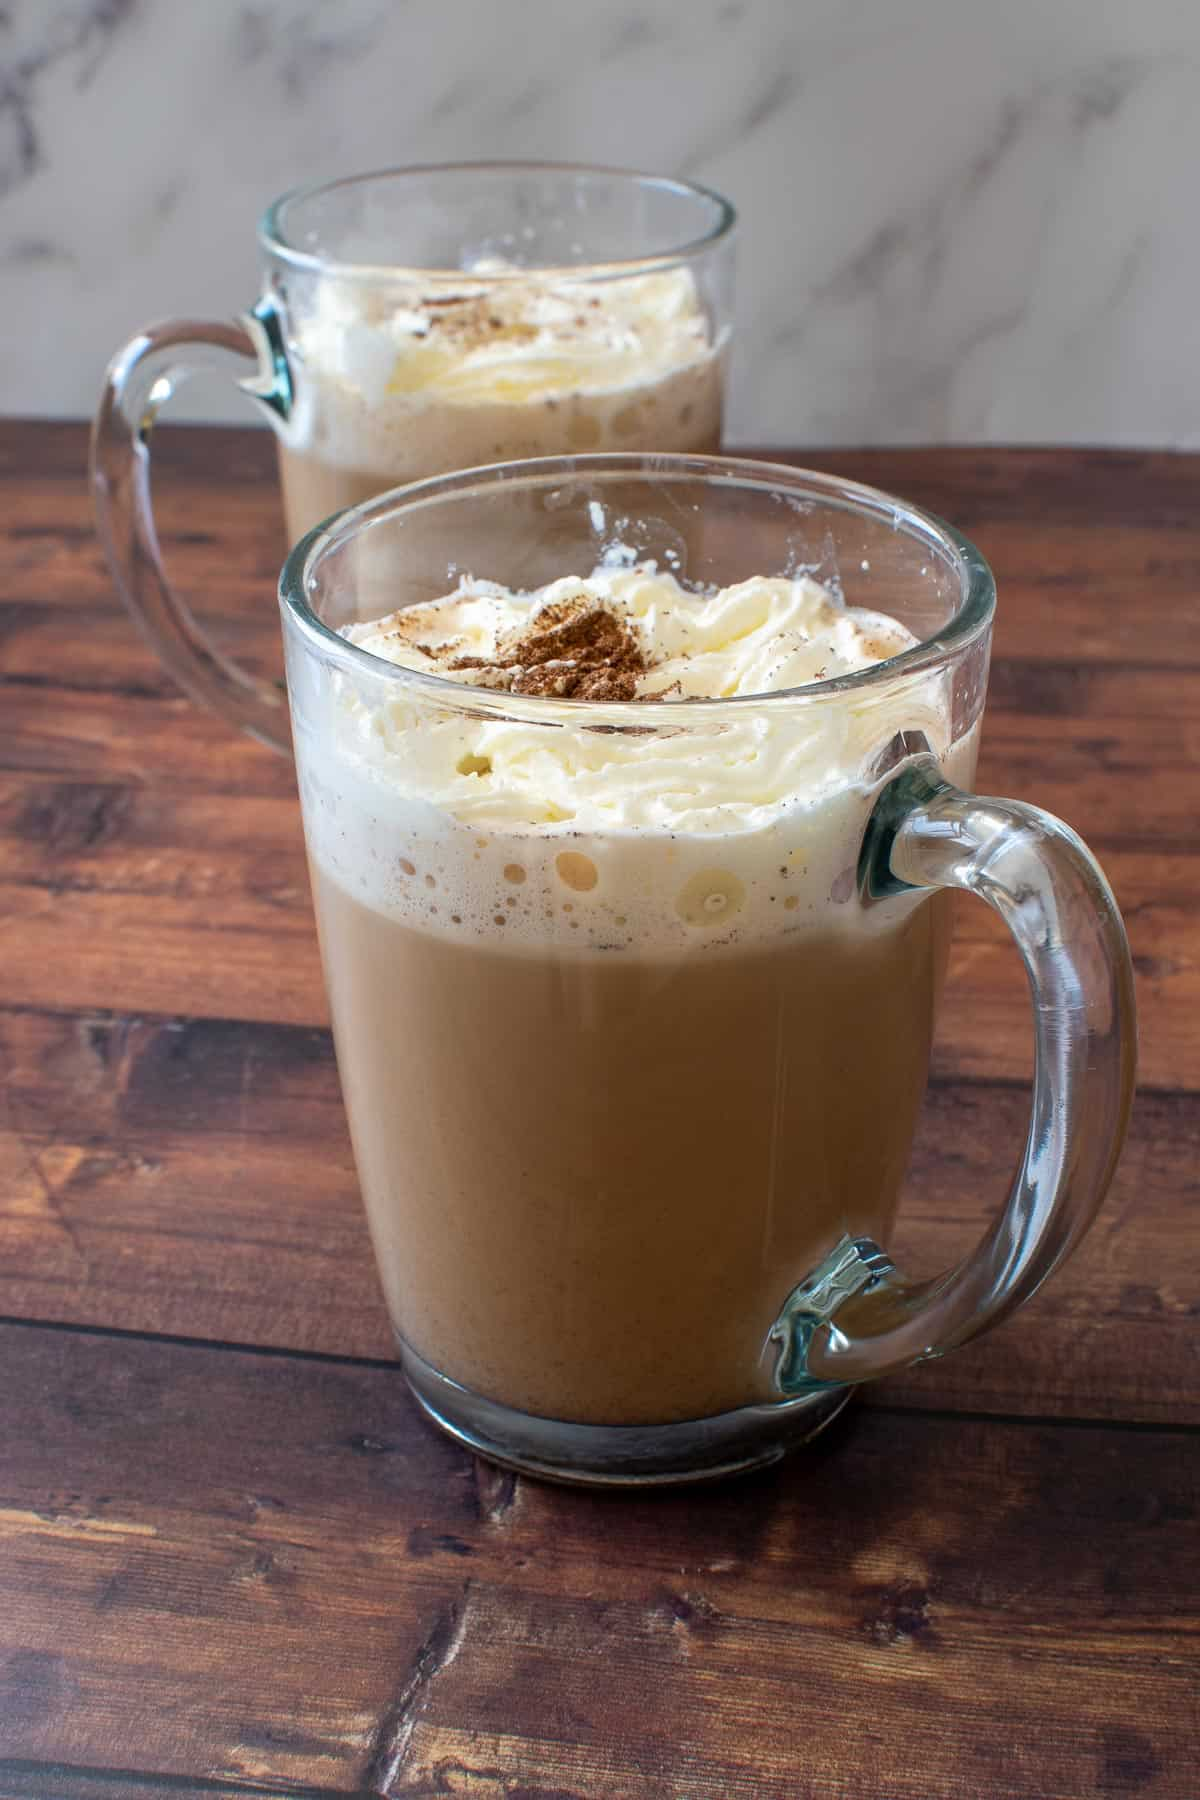 Glasses of latte with cream.